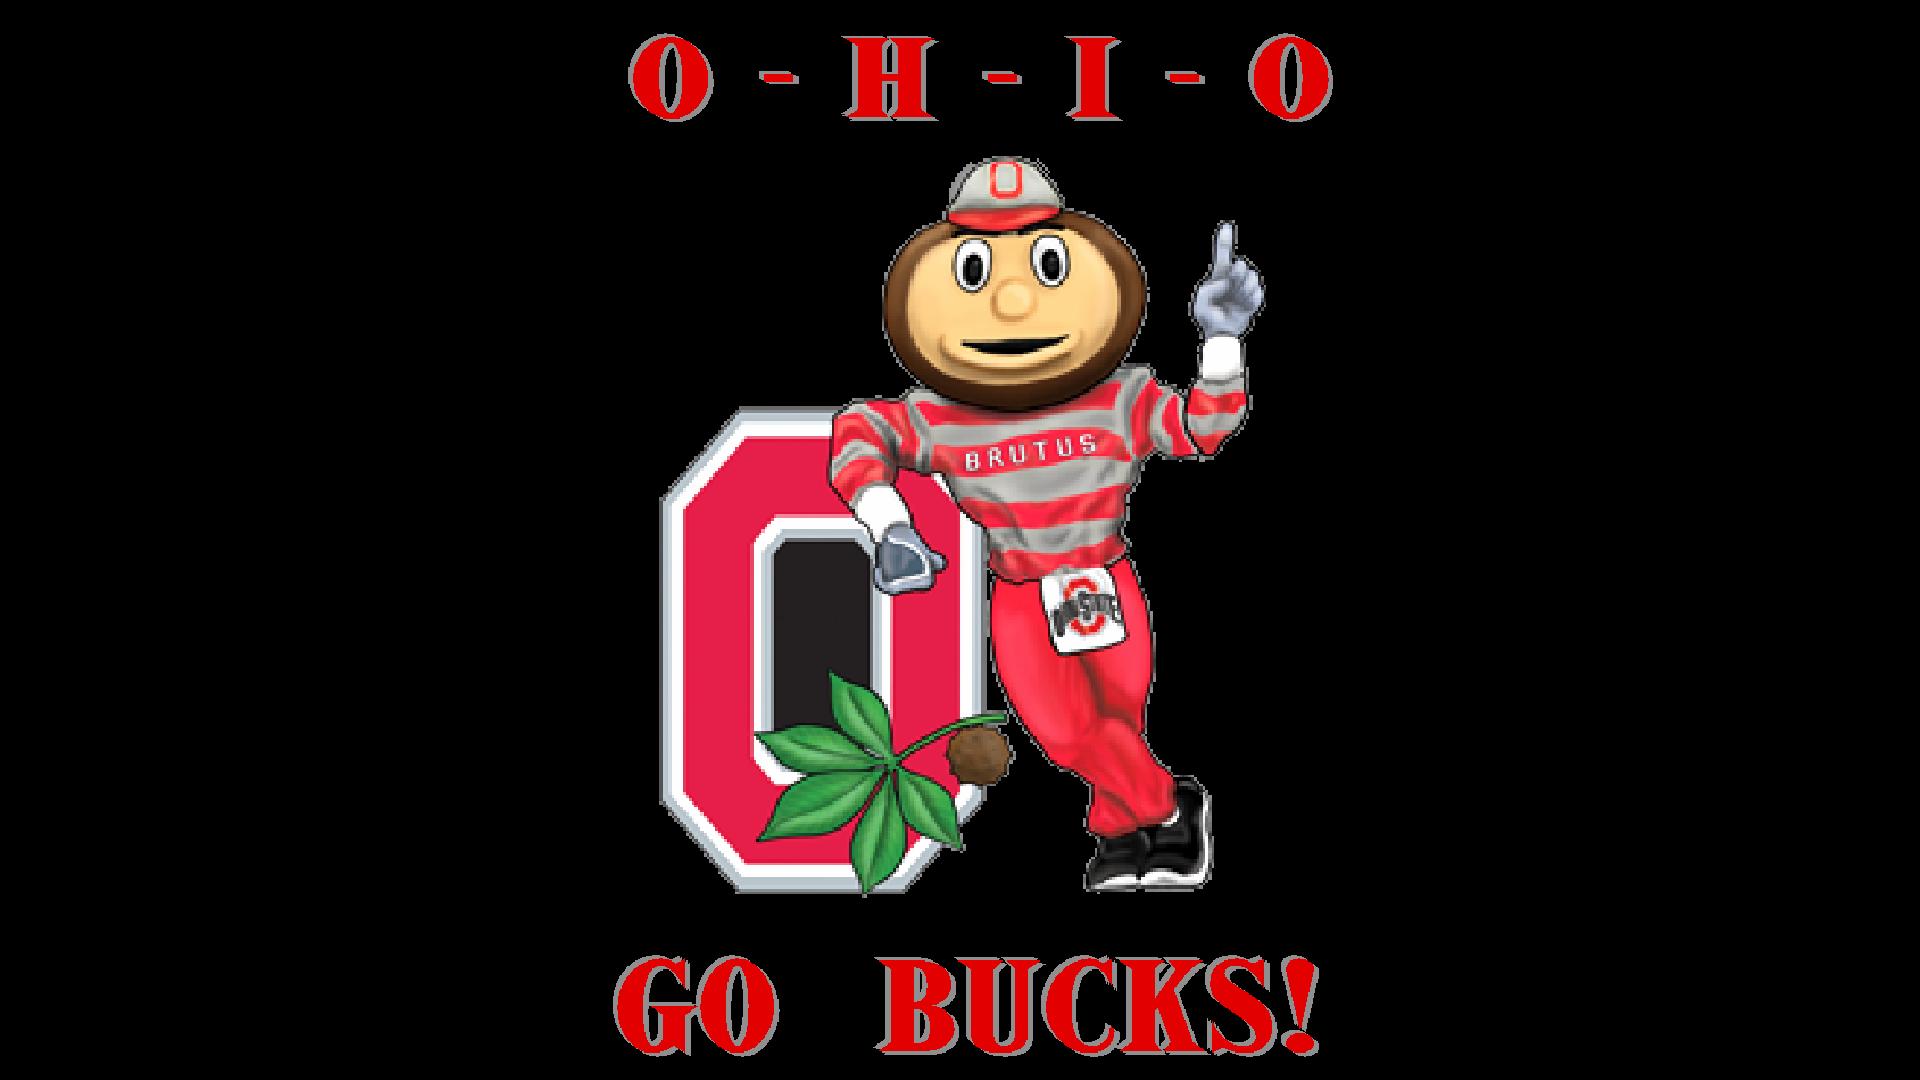 BRUTUS BUCKEYE O-H-I-O GO BUCKS!